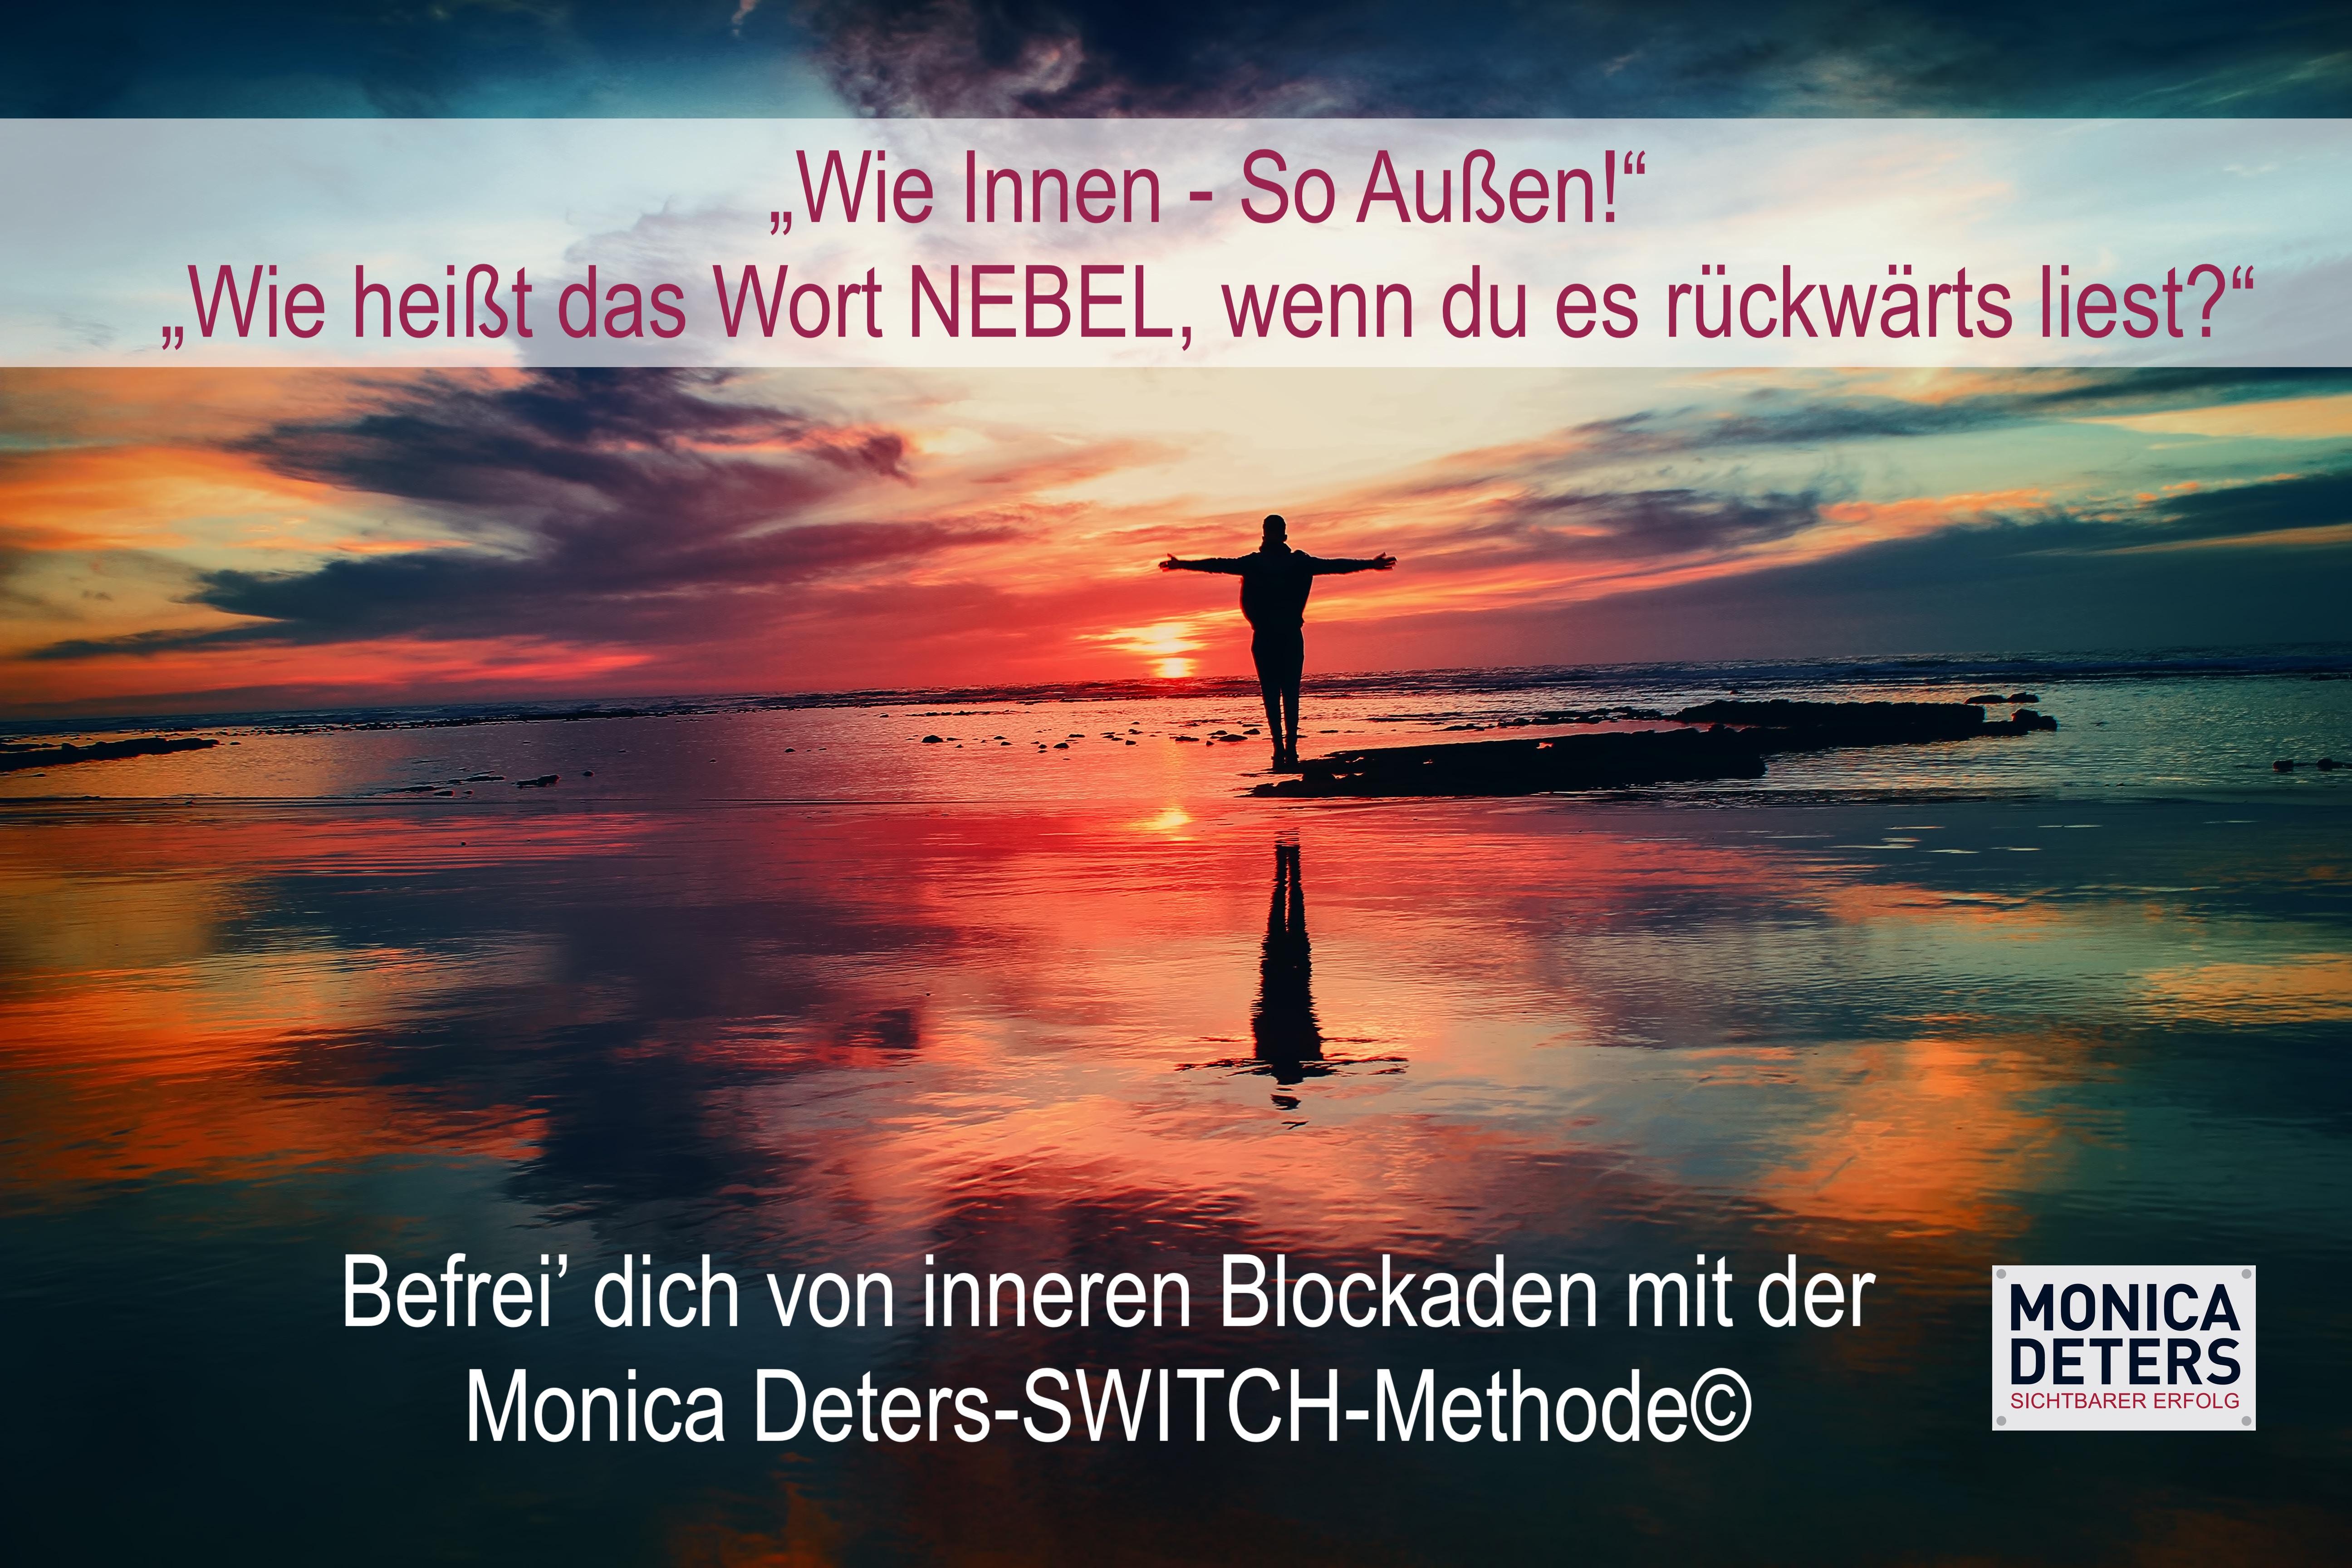 Switch-Methode2